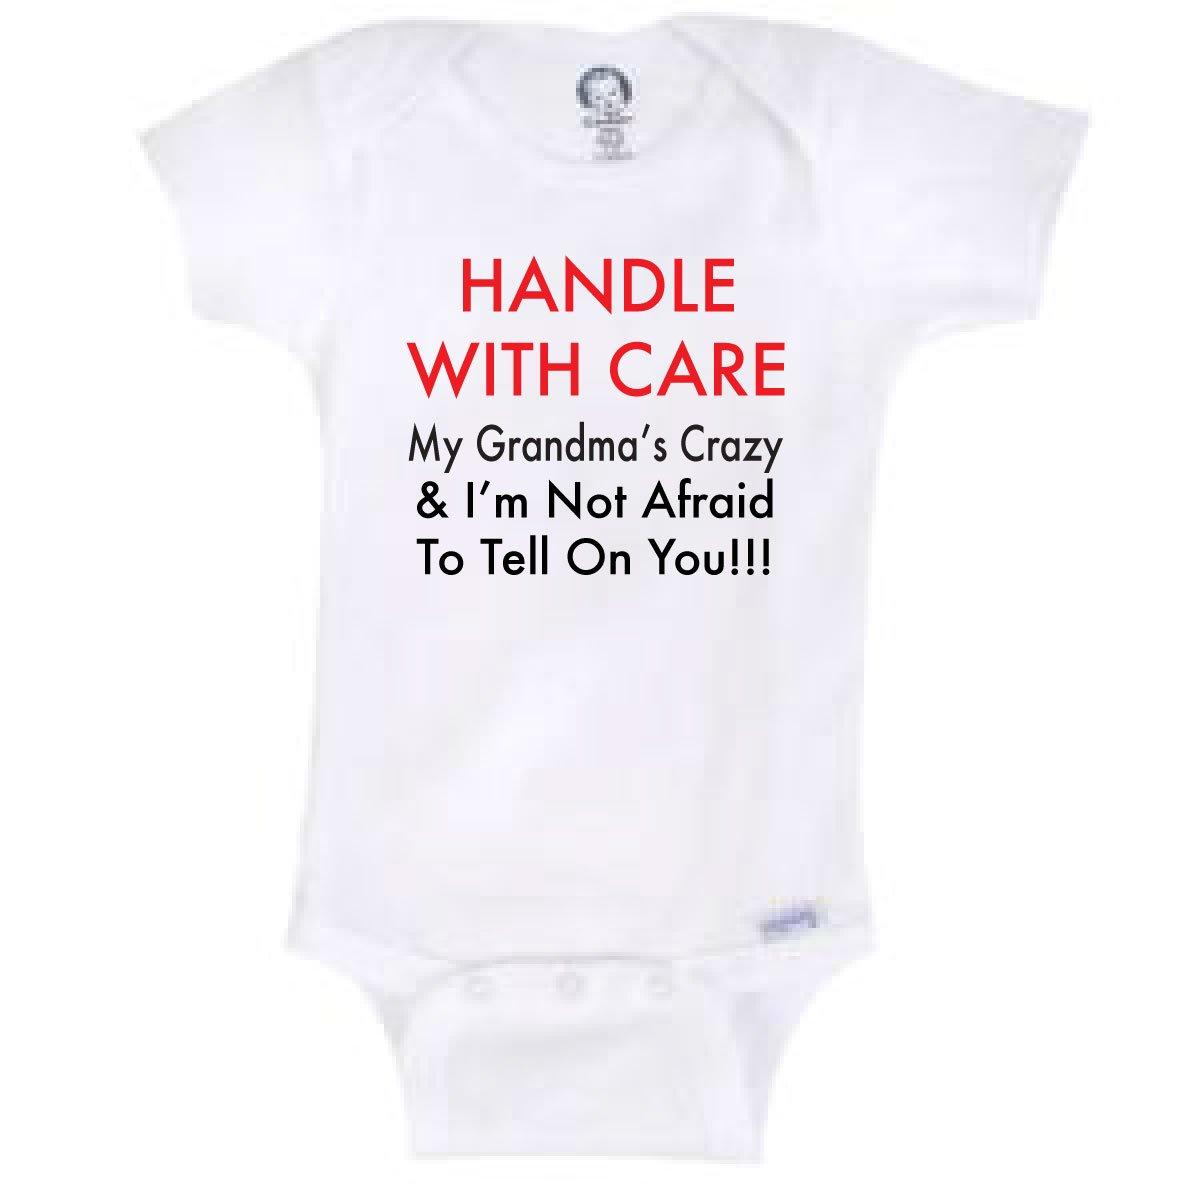 d529eb22993ed BLAKENREAG Handle with Care My Grandma's Crazy Funny Baby Onesie Gerber  Novelty Shirt